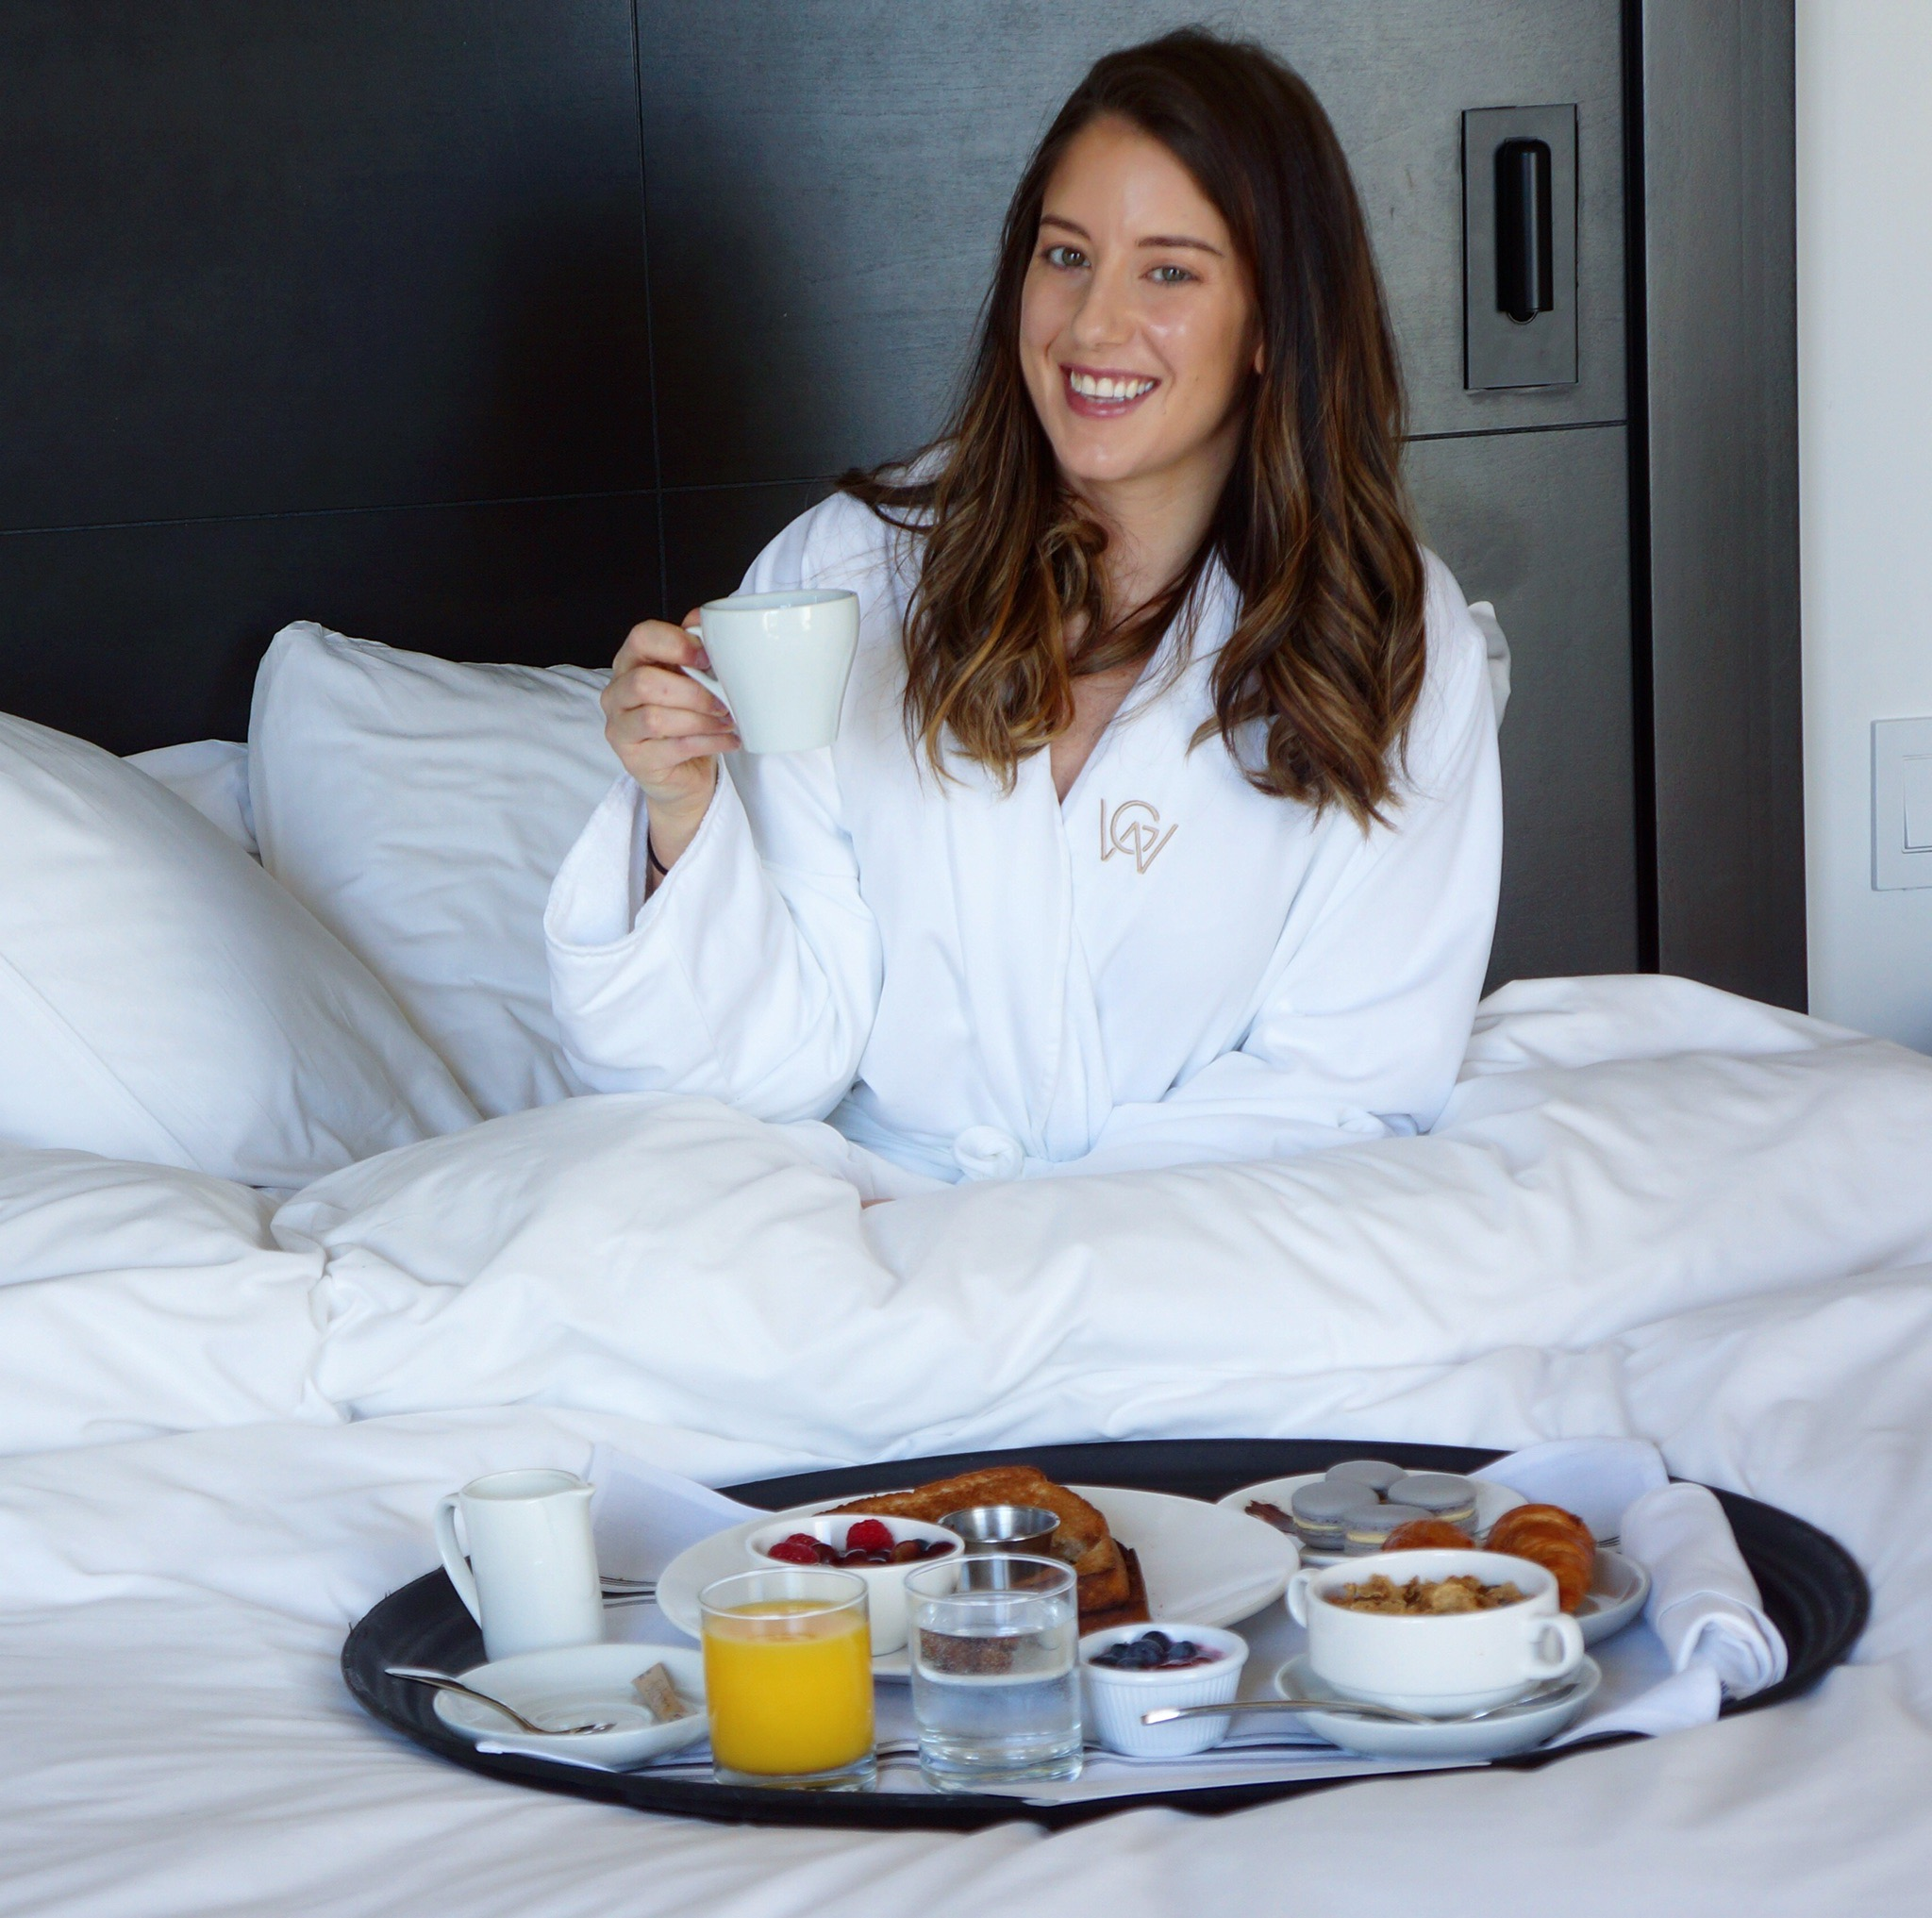 Enjoying Breakfast in bed at Hotel William Gray